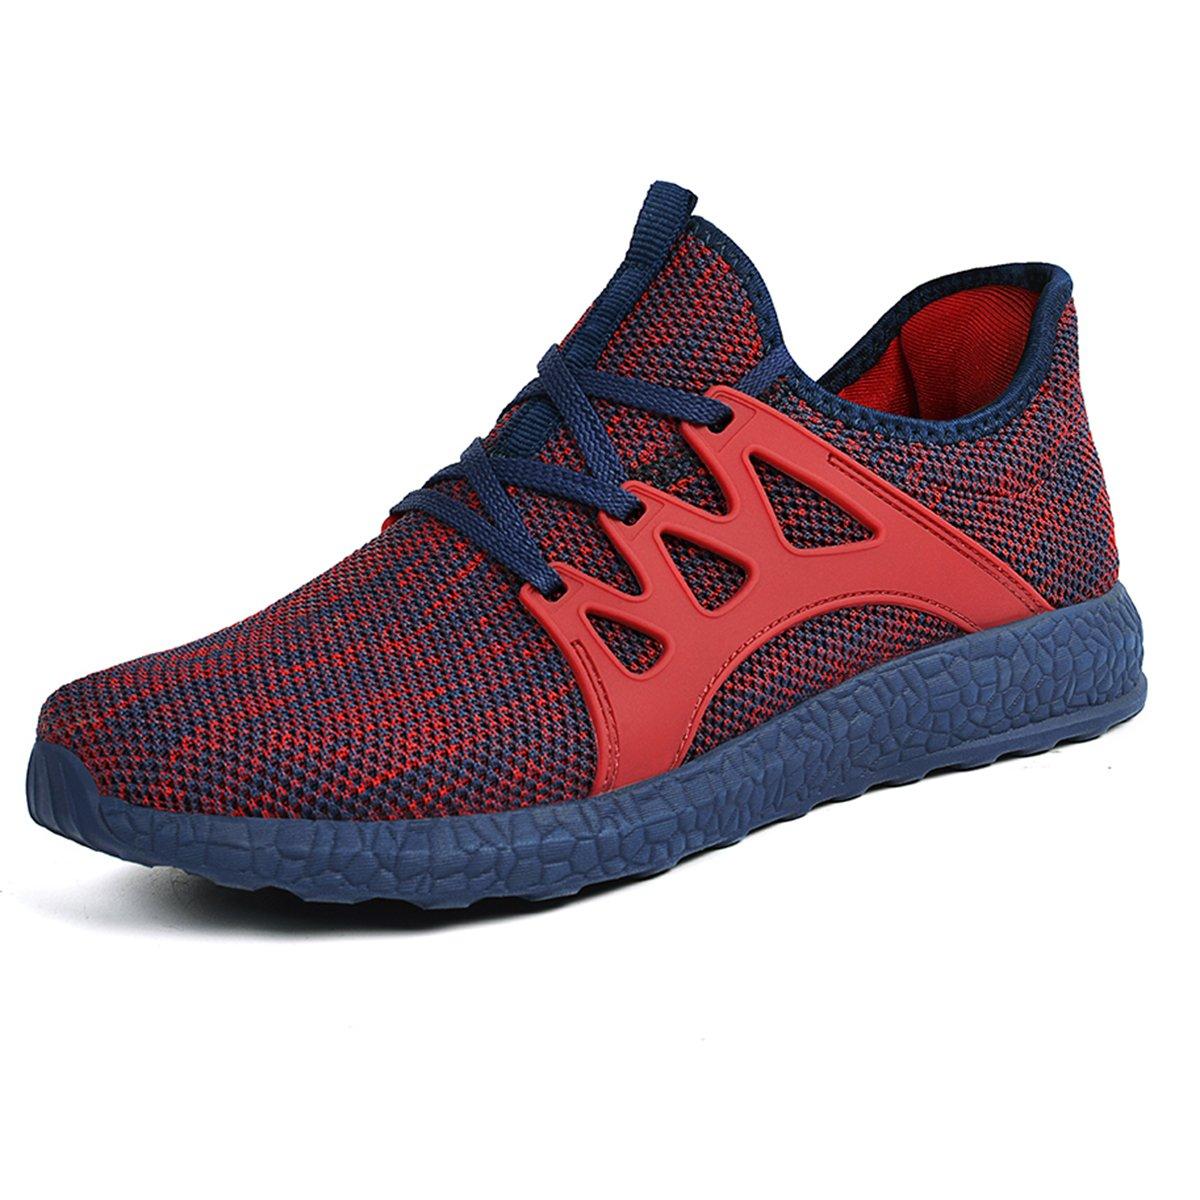 Red bluee Mxson Women's Ultra Lightweight Breathable Mesh Street Sport Walking shoes Casual Sneakers